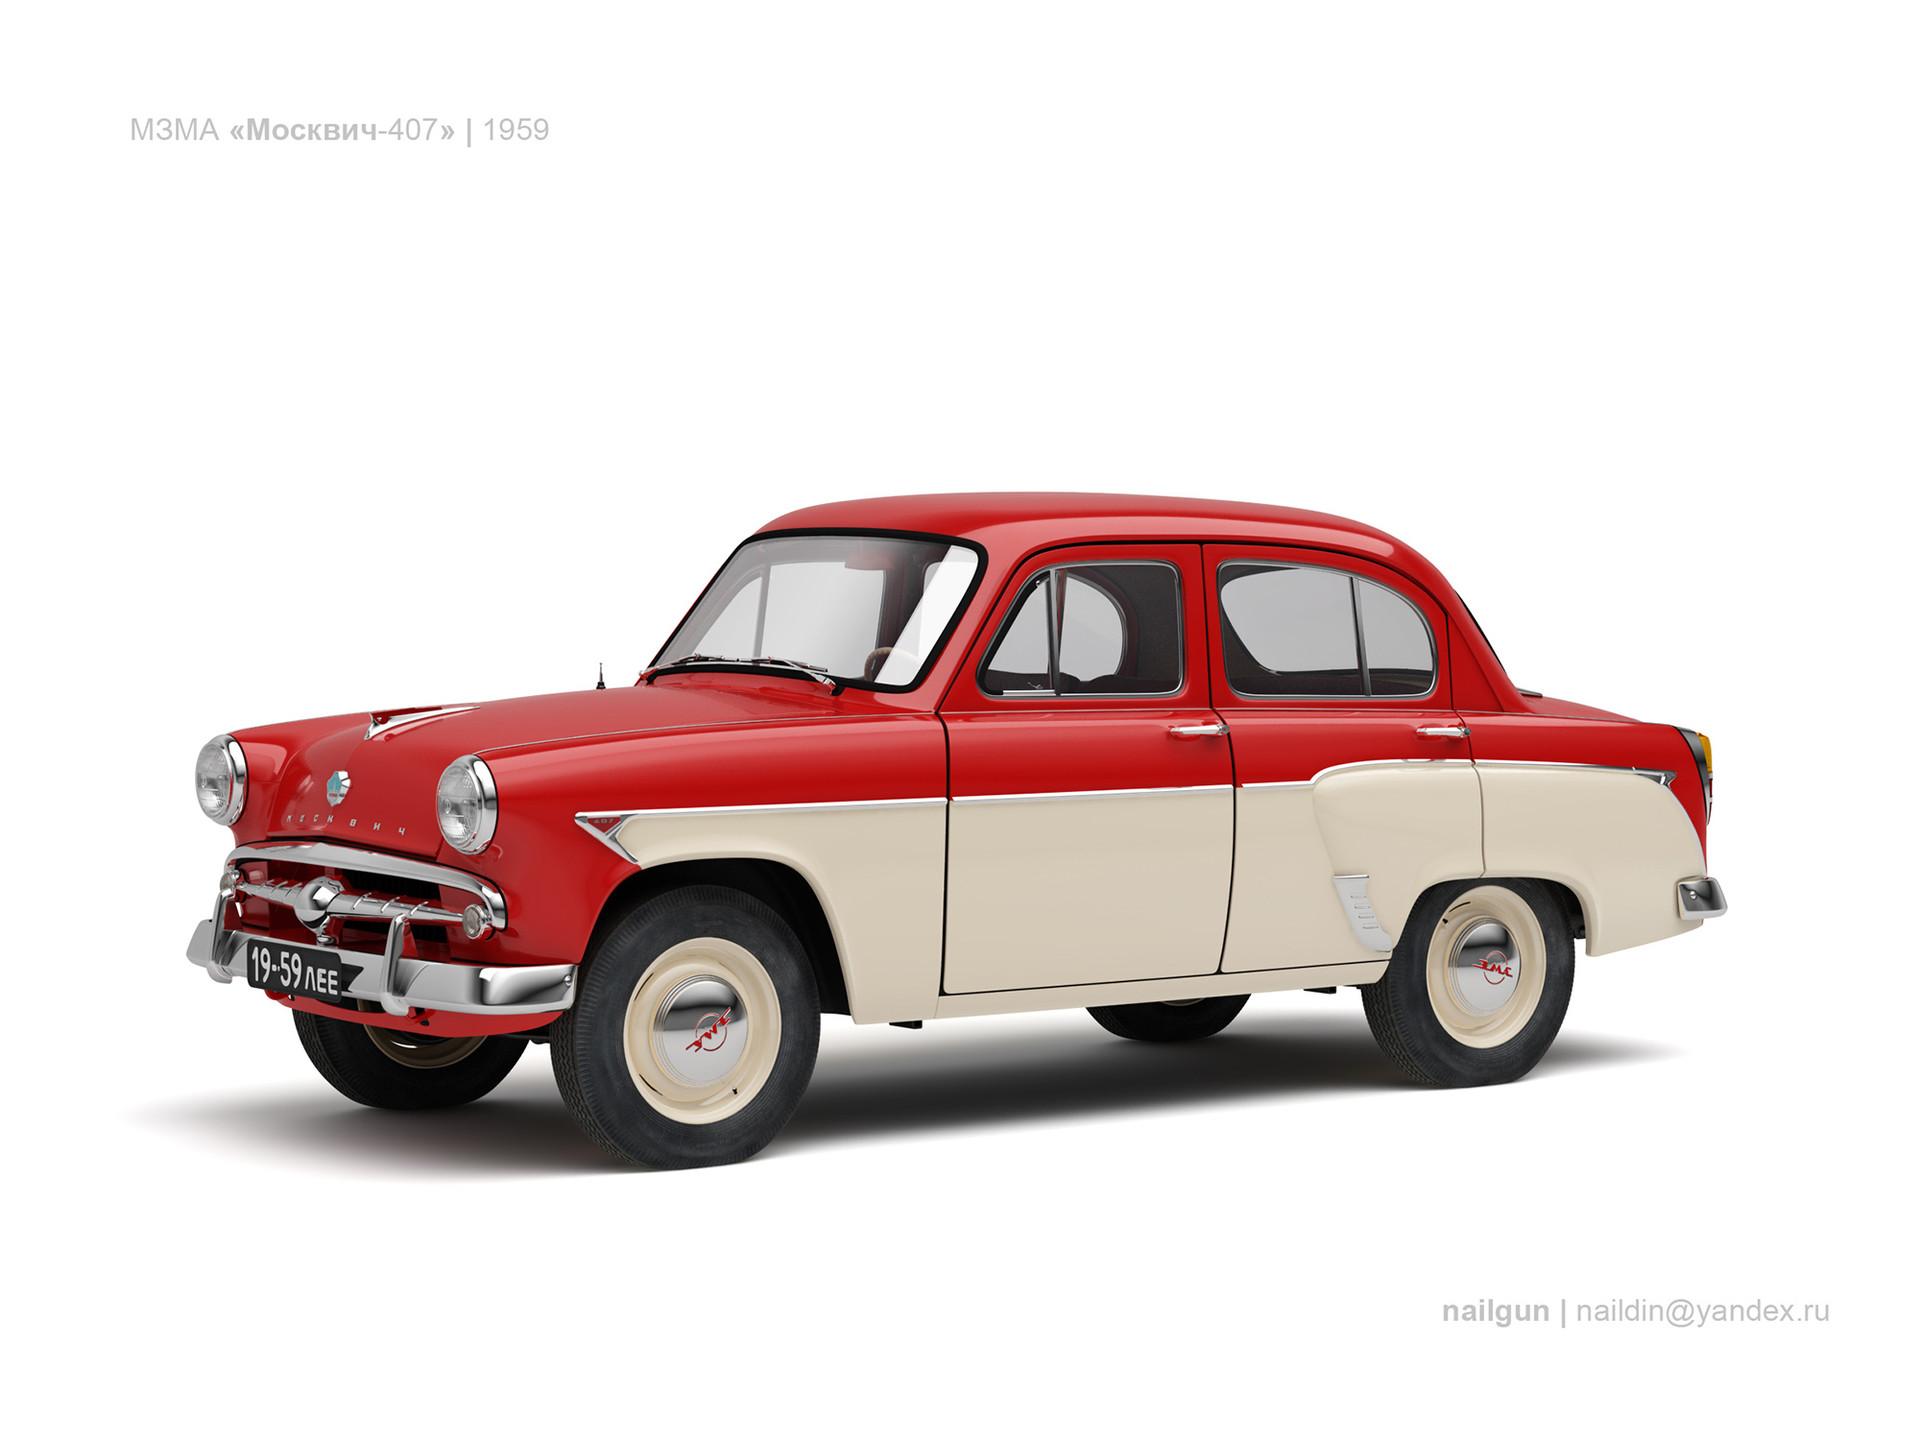 Nail khusnutdinov ussr moskvich 407 1959 0